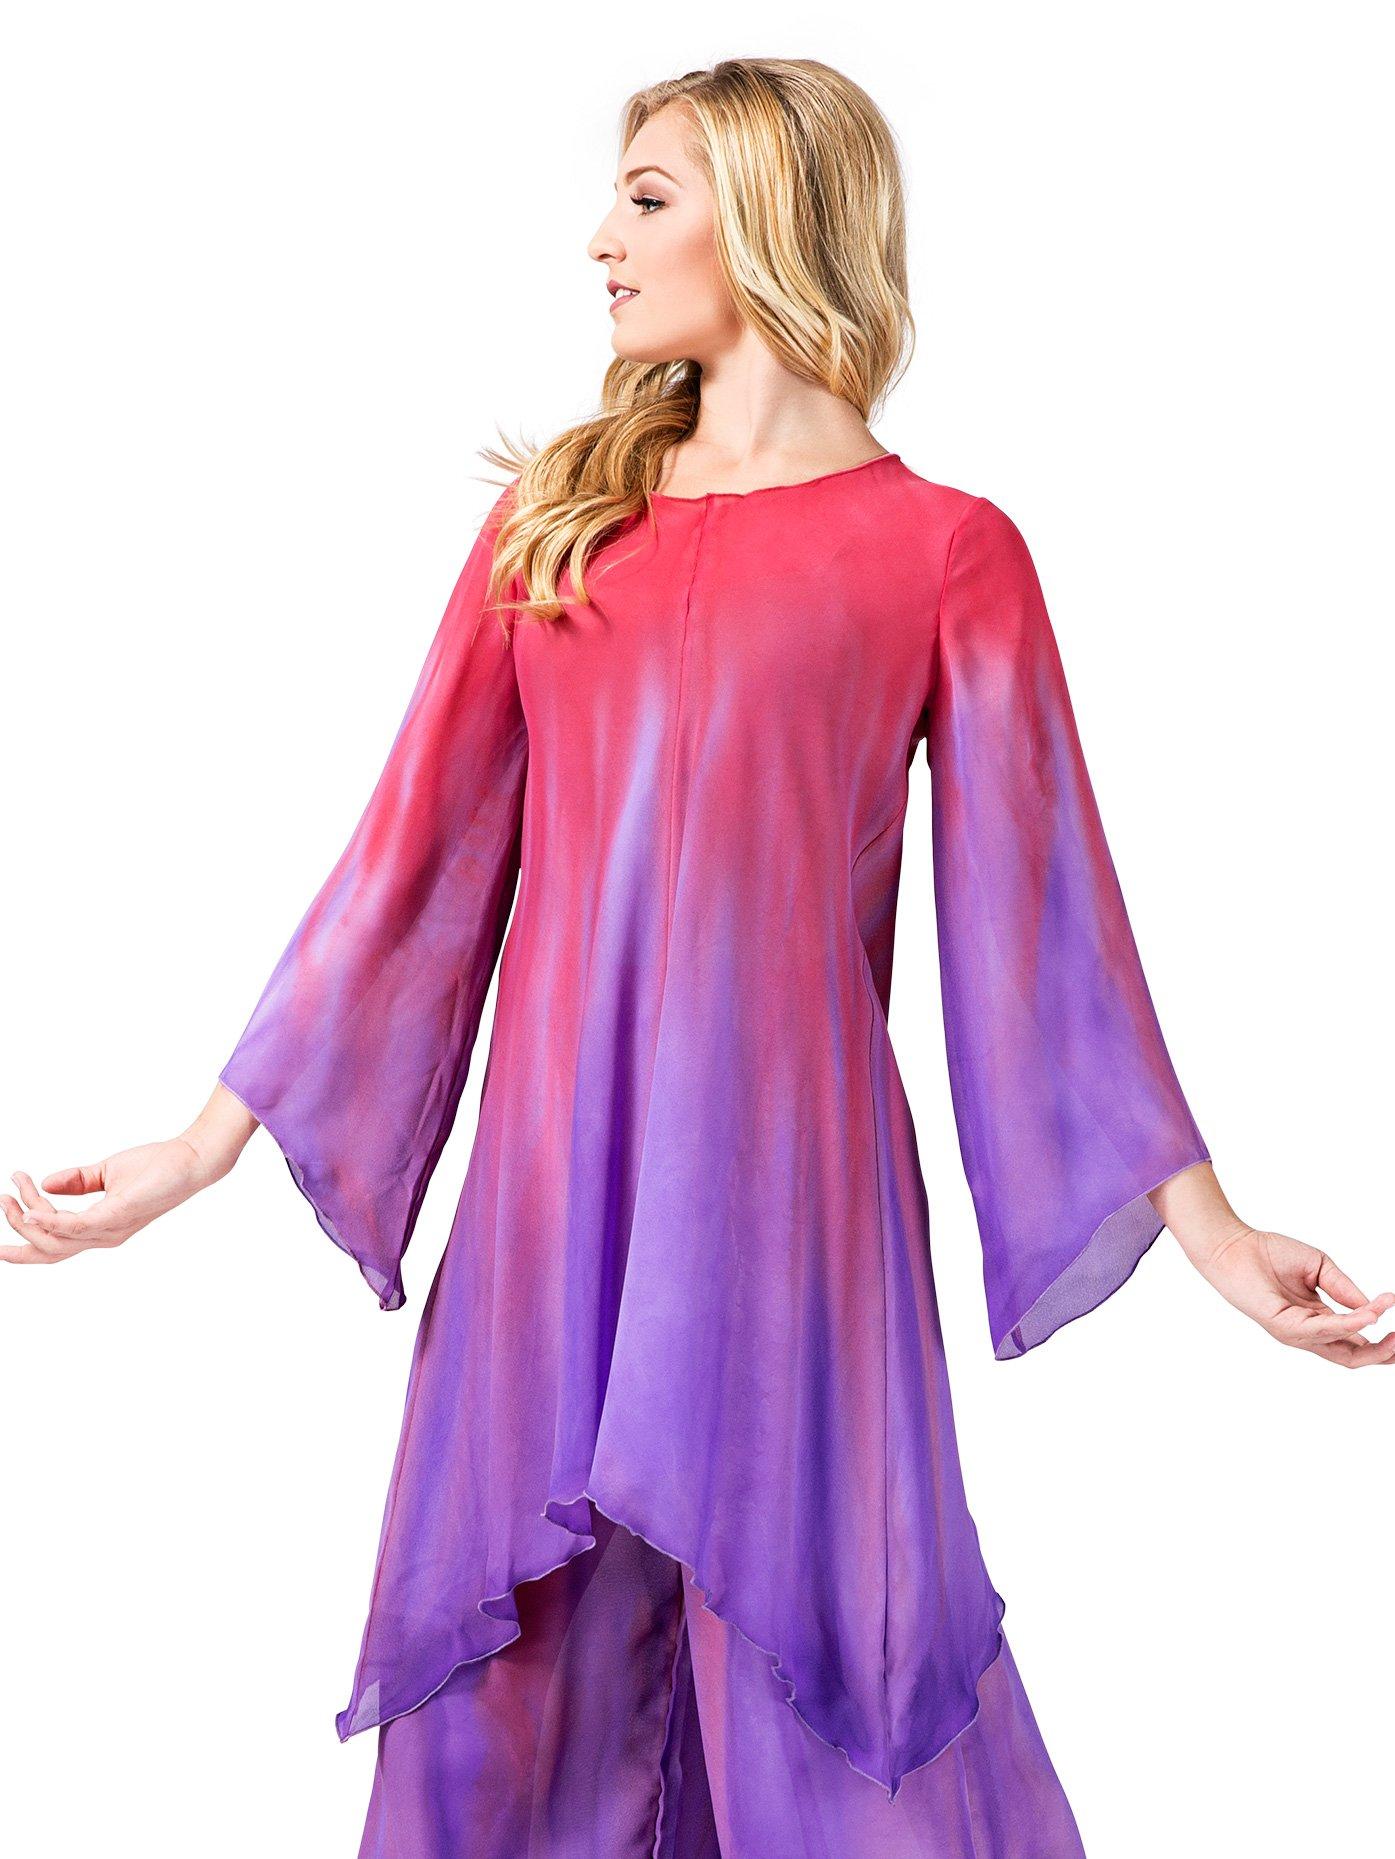 Watercolour Women's Worship Long Sleeve Tunic,WC101GOBLPS,Gold/Blue,PS